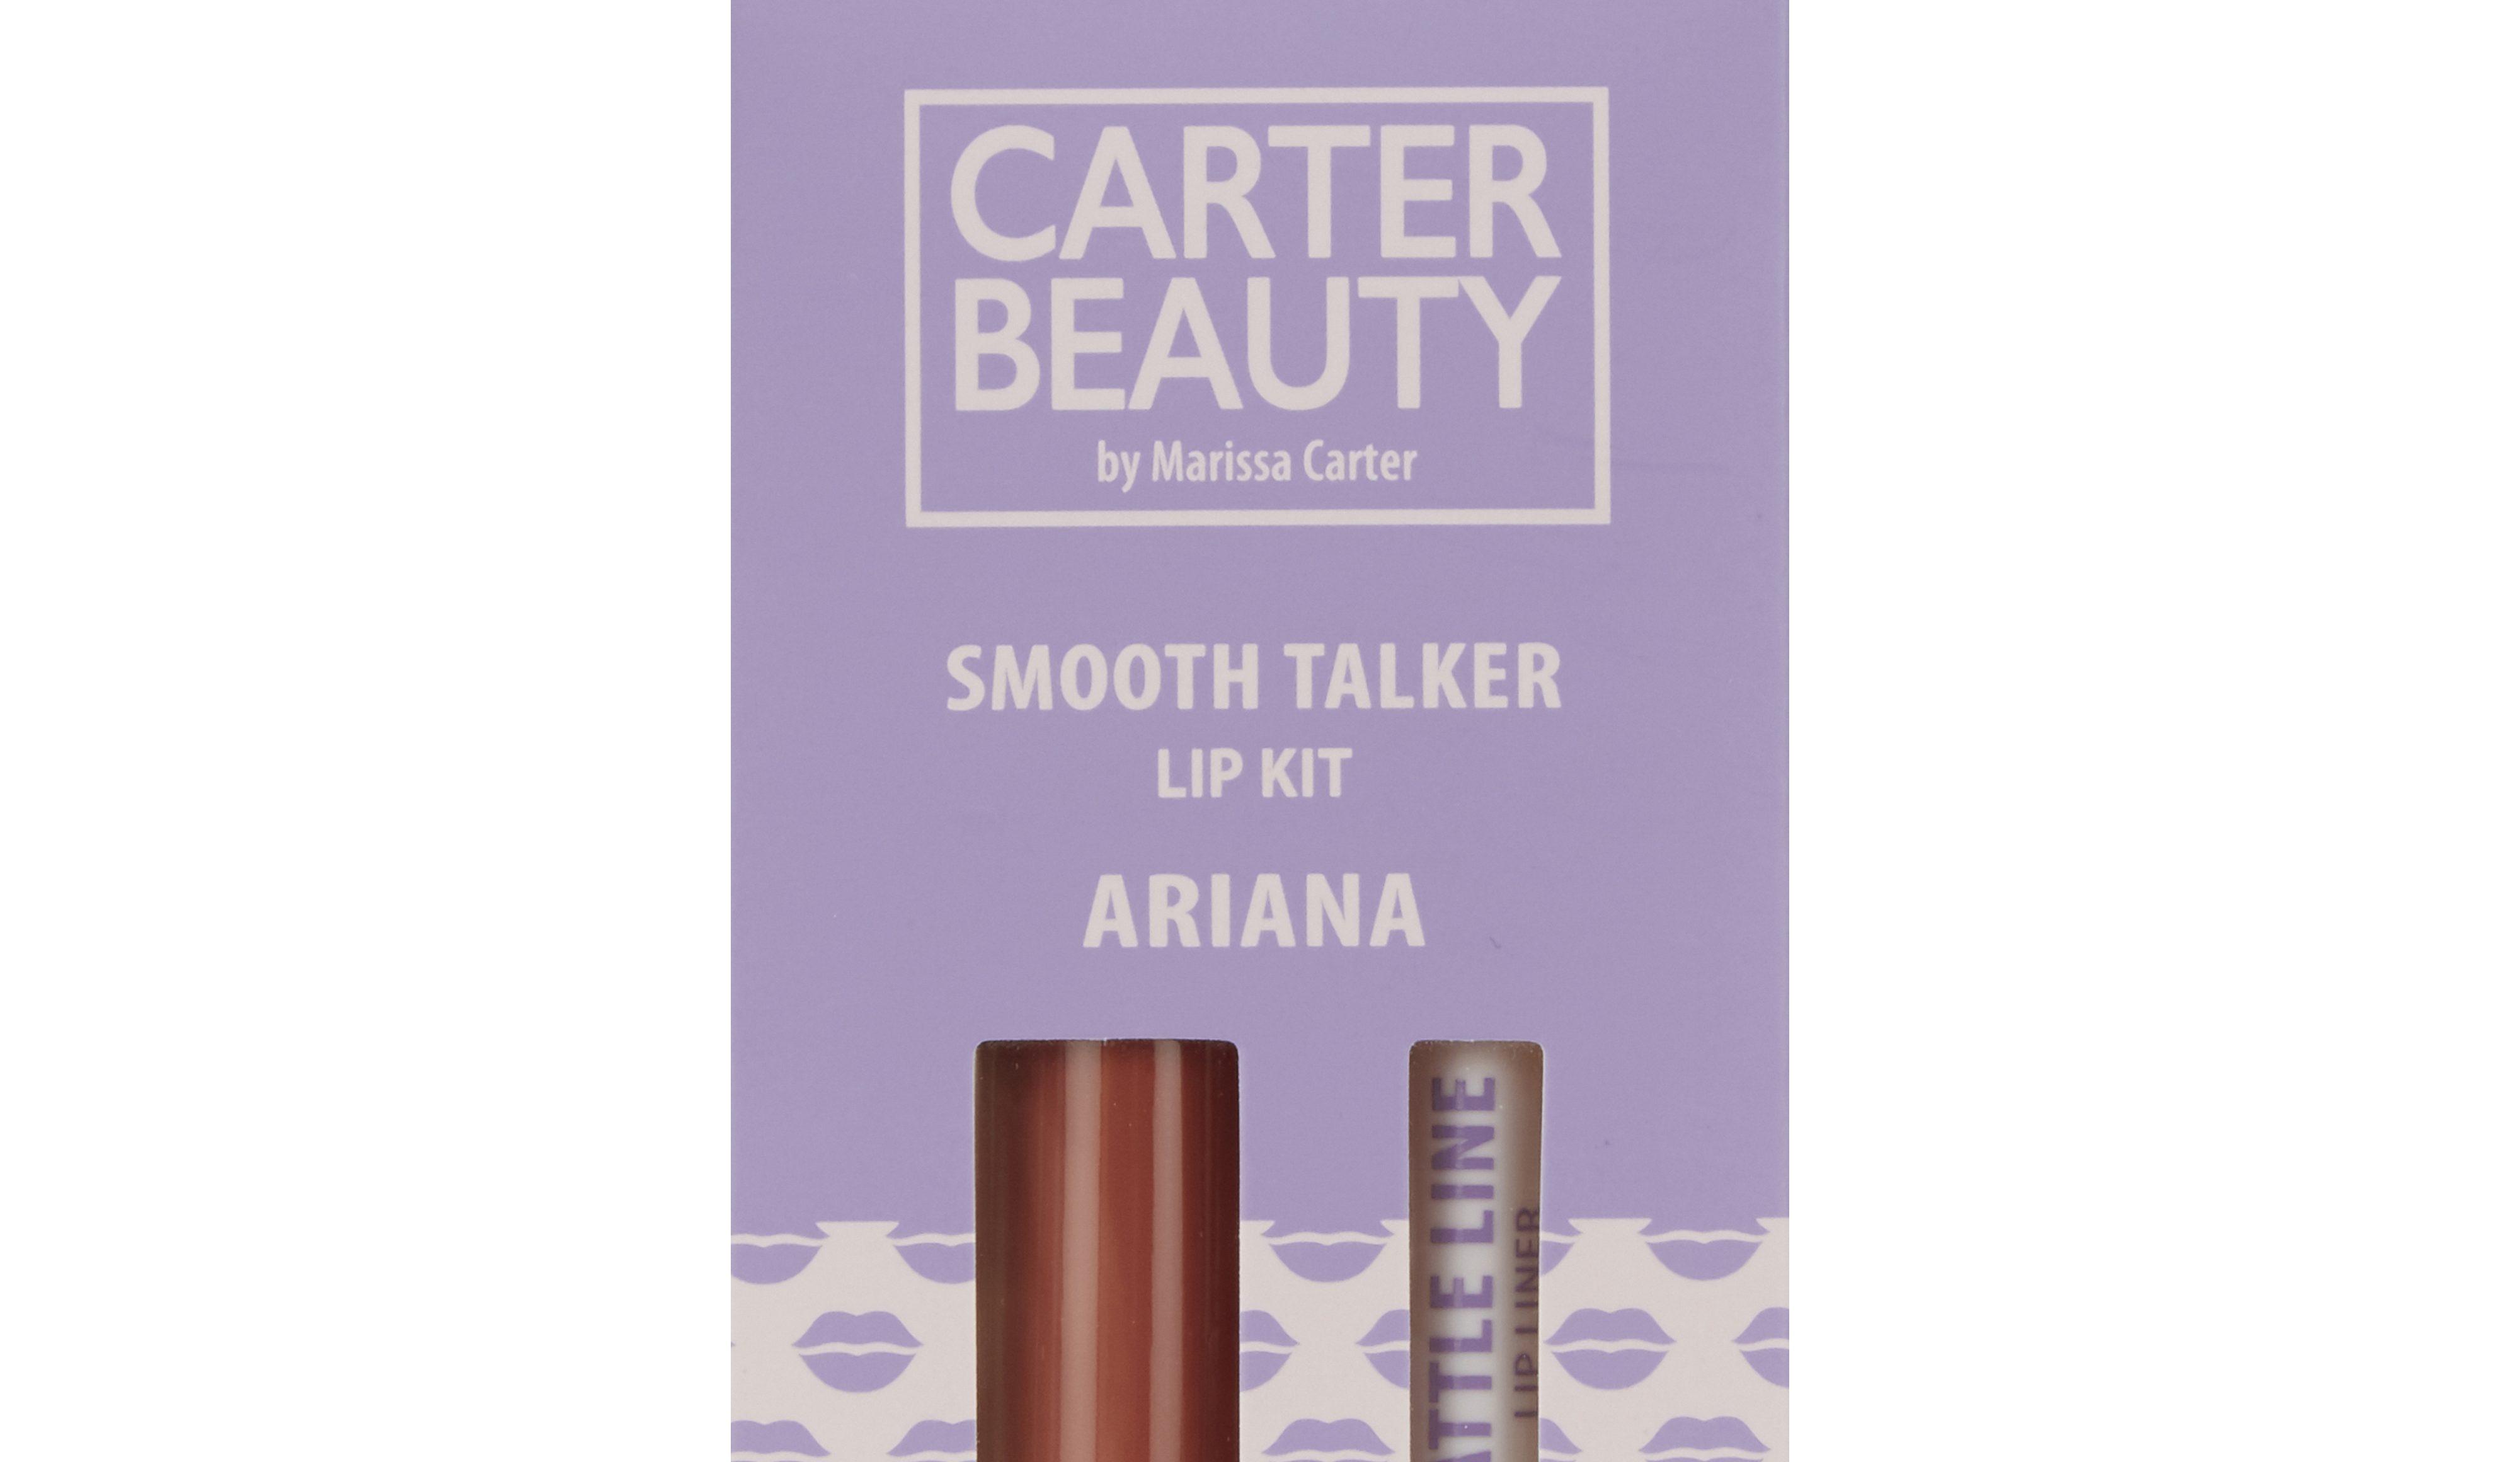 Carter Beauty by Marissa Carter Smooth Talker Lip Kit_Ariana_ €9.95 01